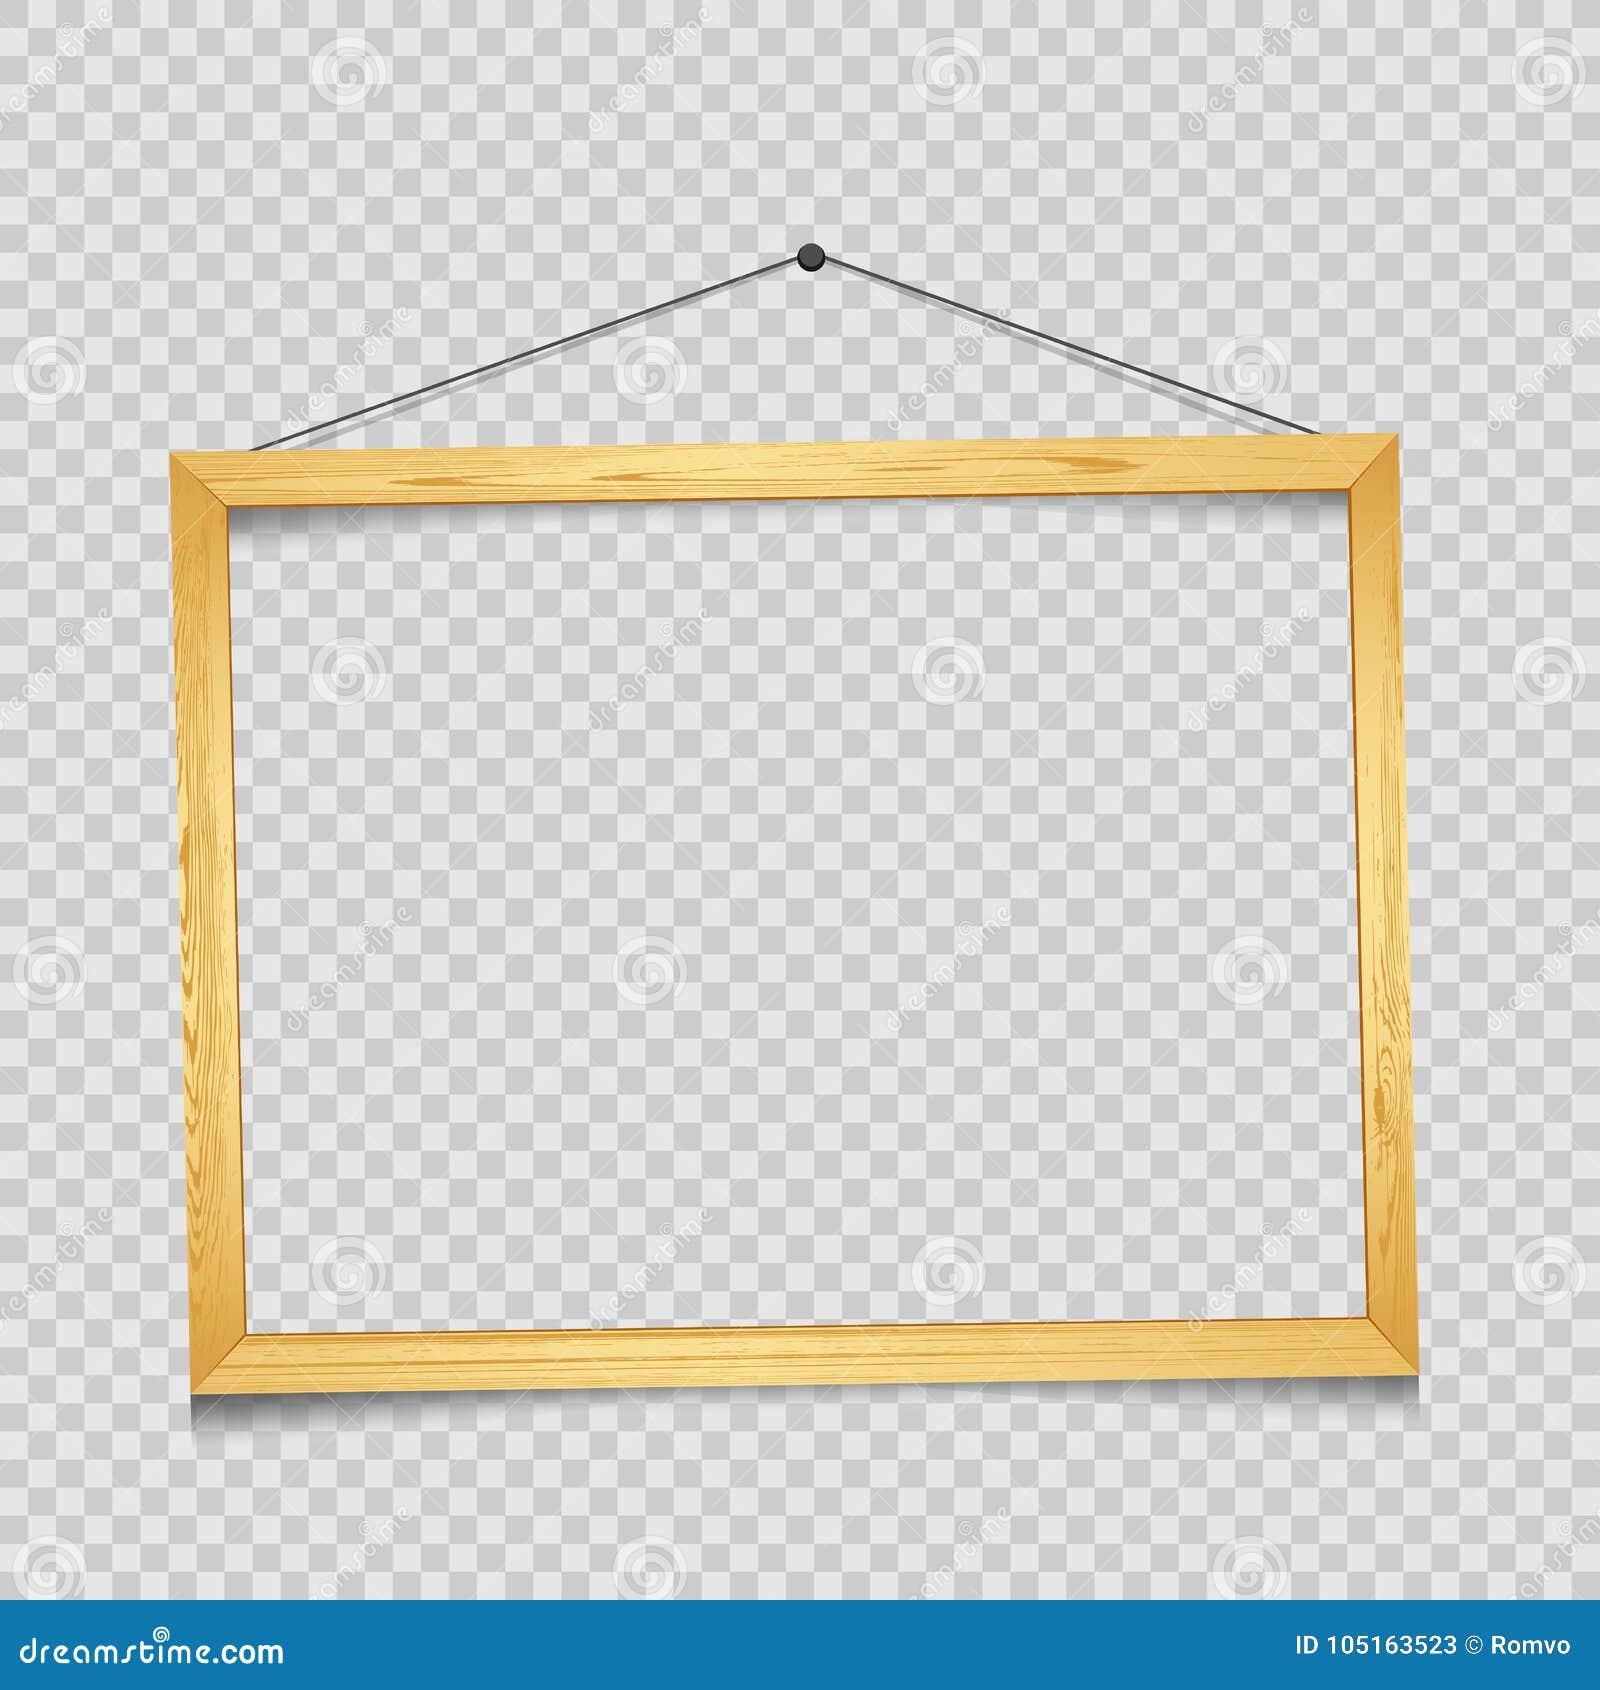 Wooden Rectangular Frame Transparent Stock Vector